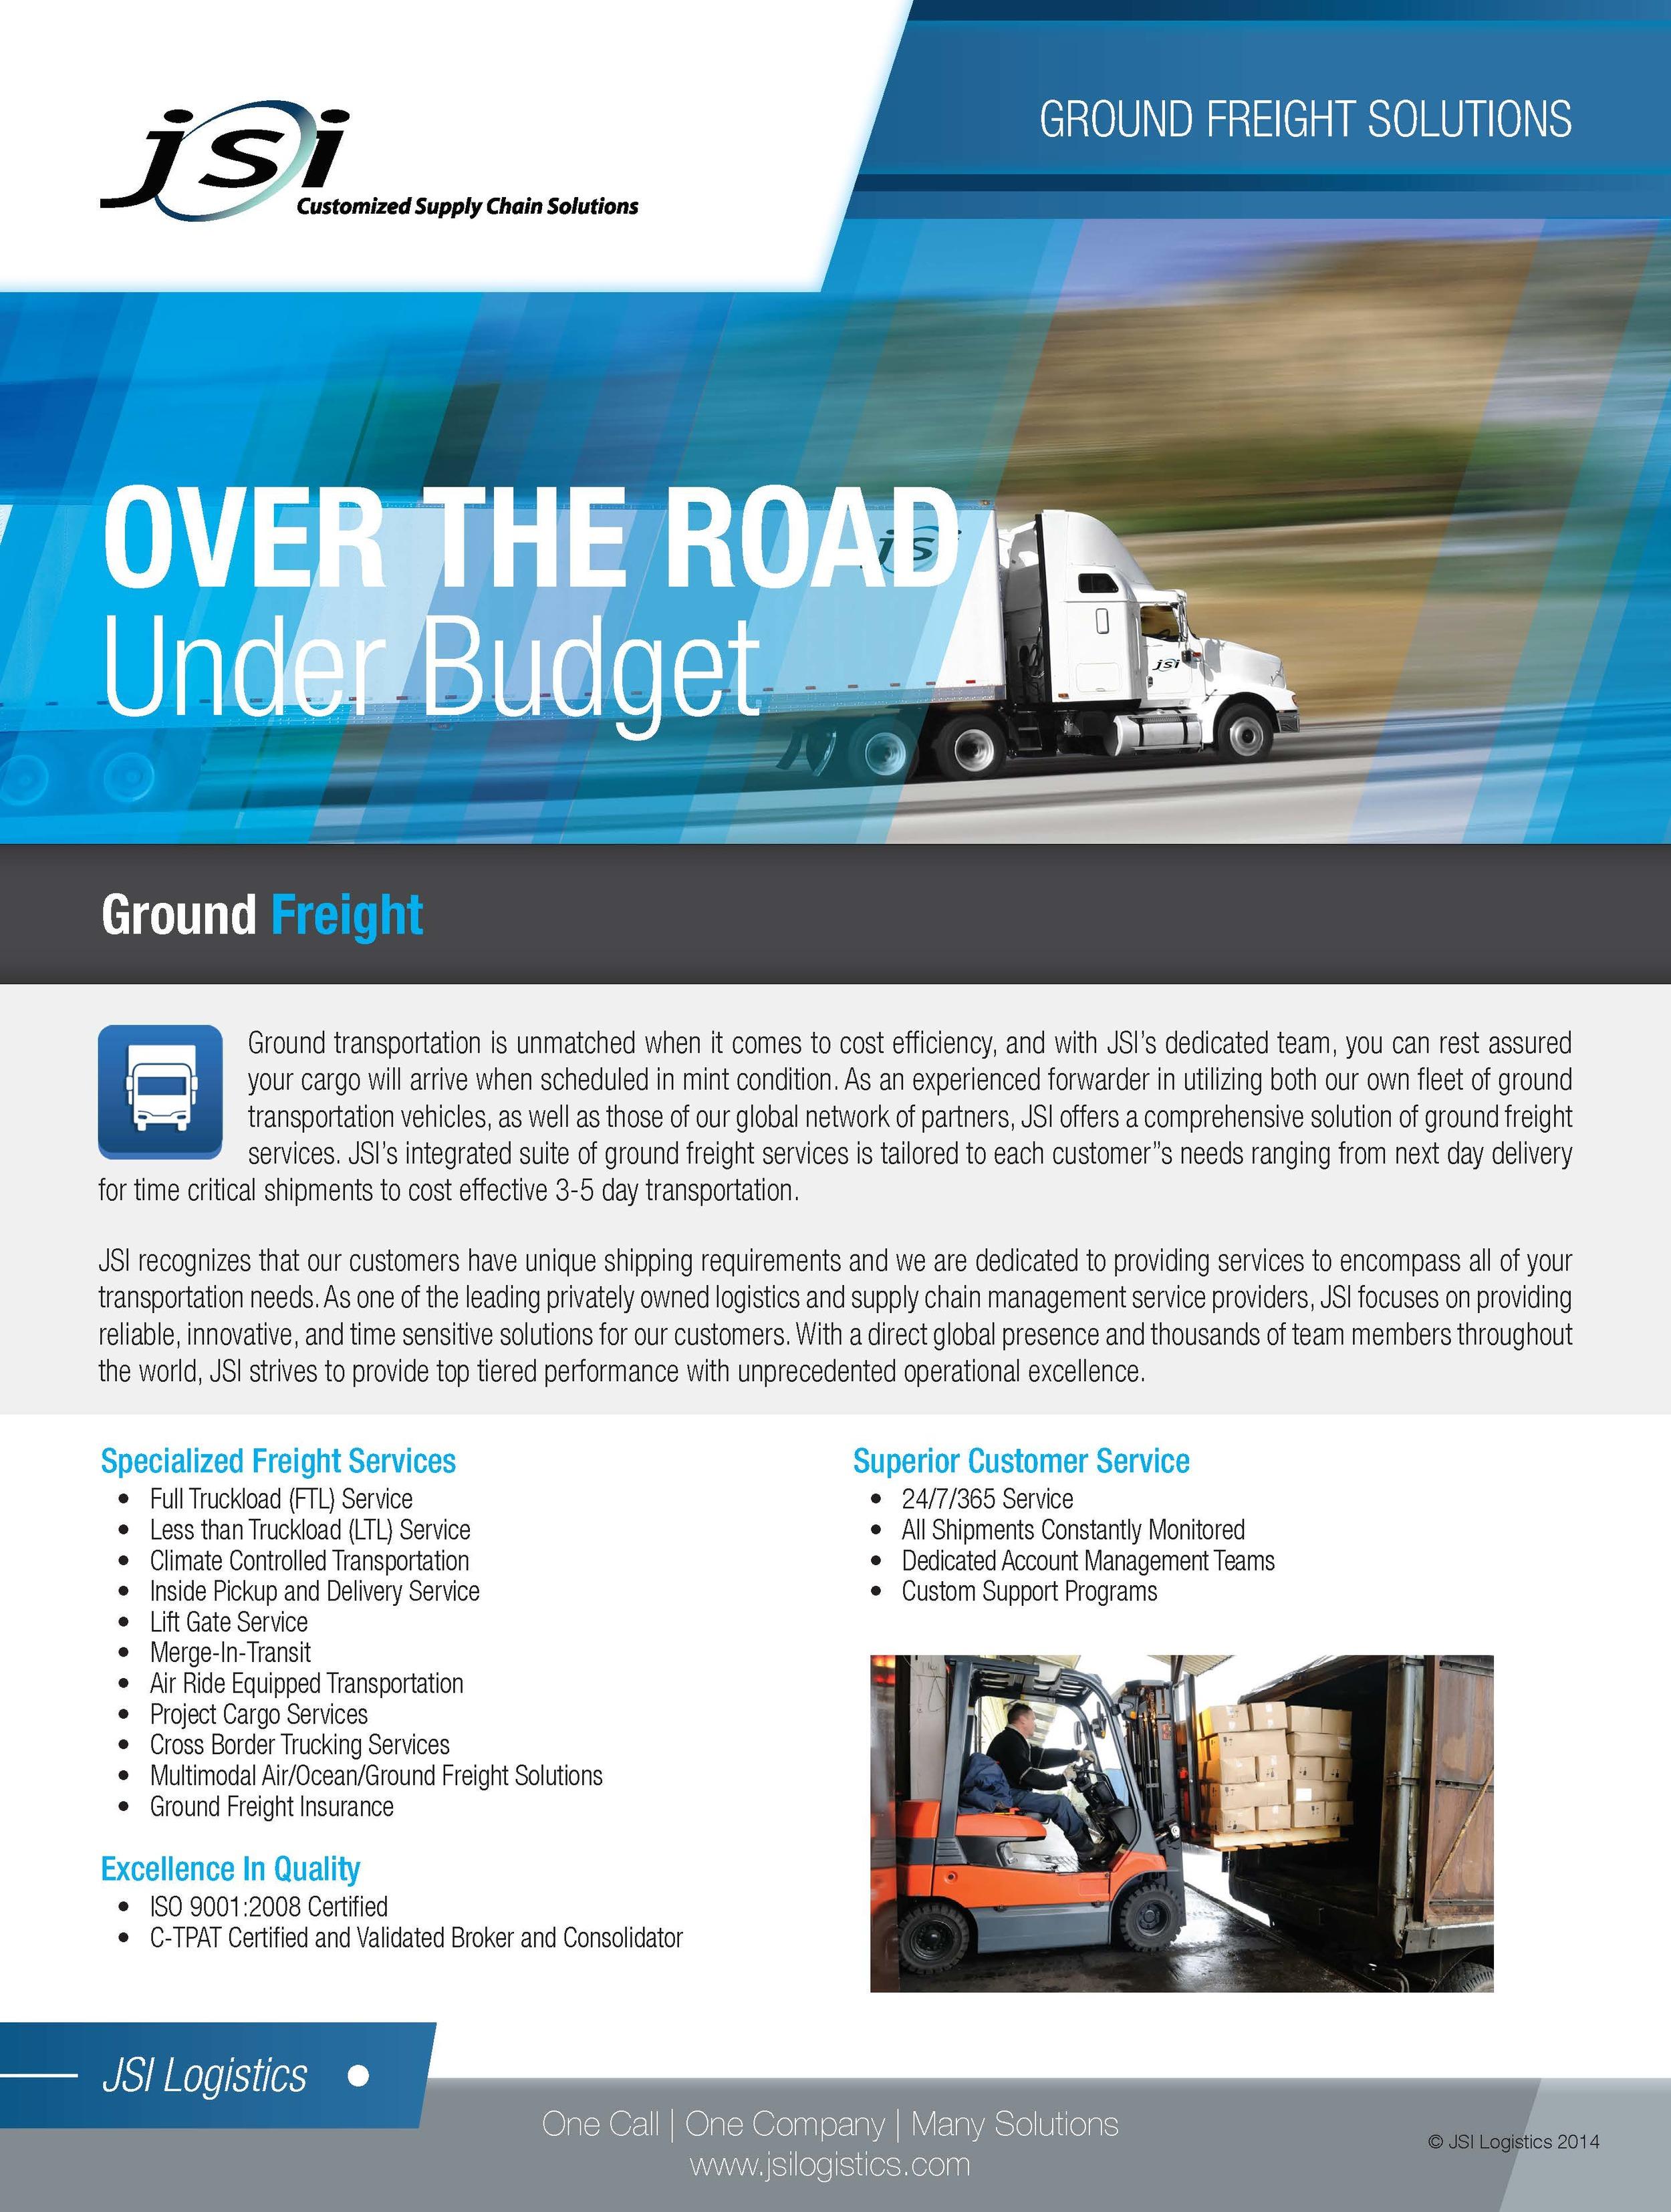 Ground Freight Services Flyer